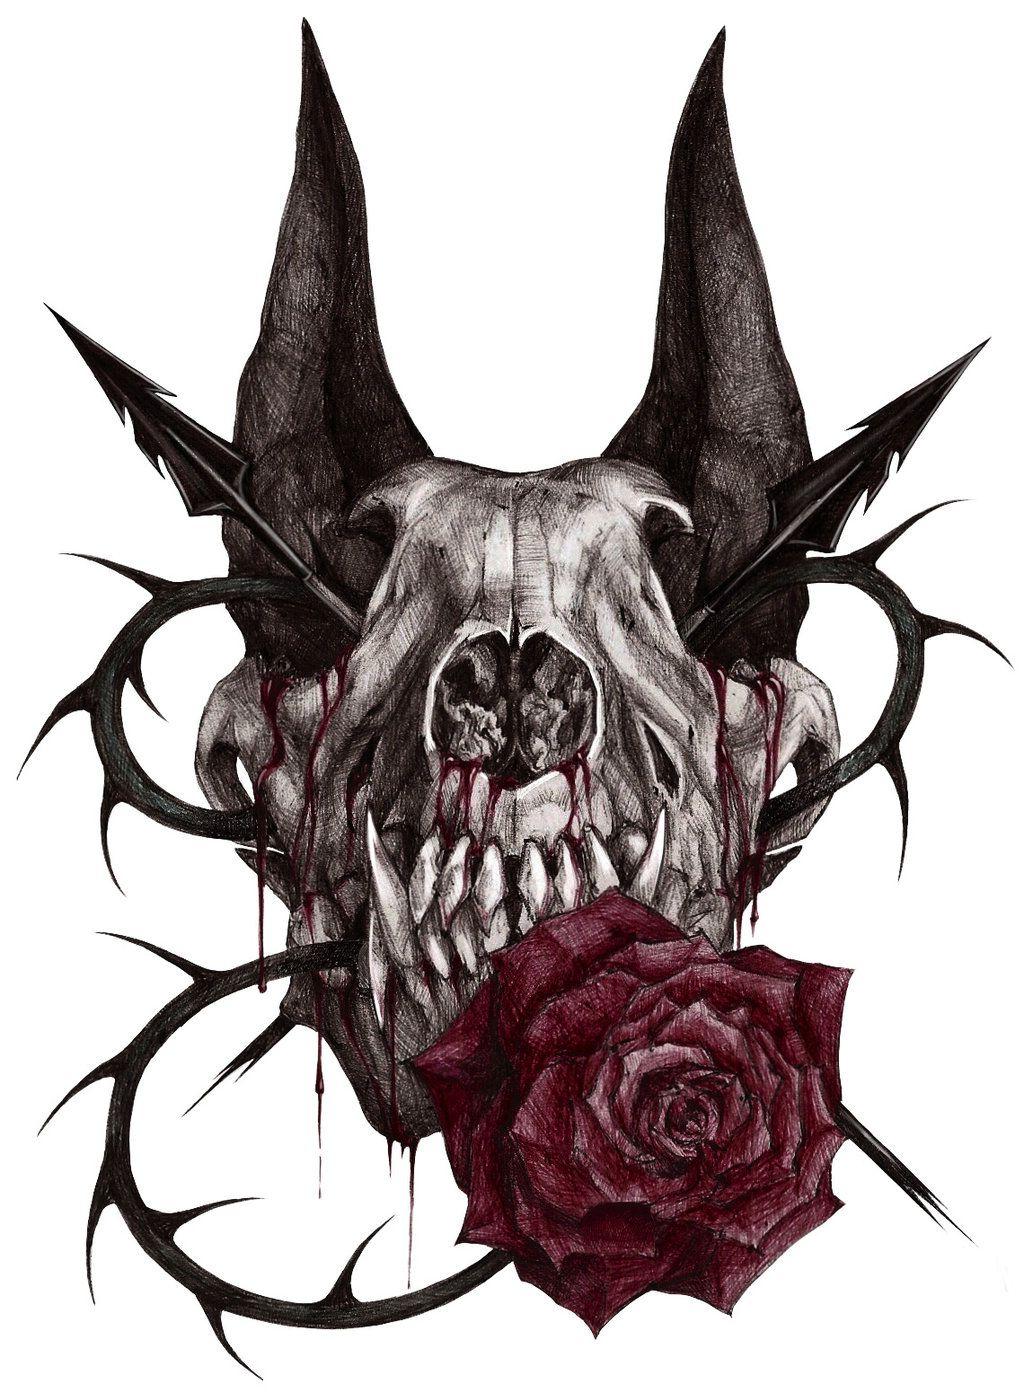 wolf skull by xx samira hunter on deviantart designs tattoos pinte. Black Bedroom Furniture Sets. Home Design Ideas